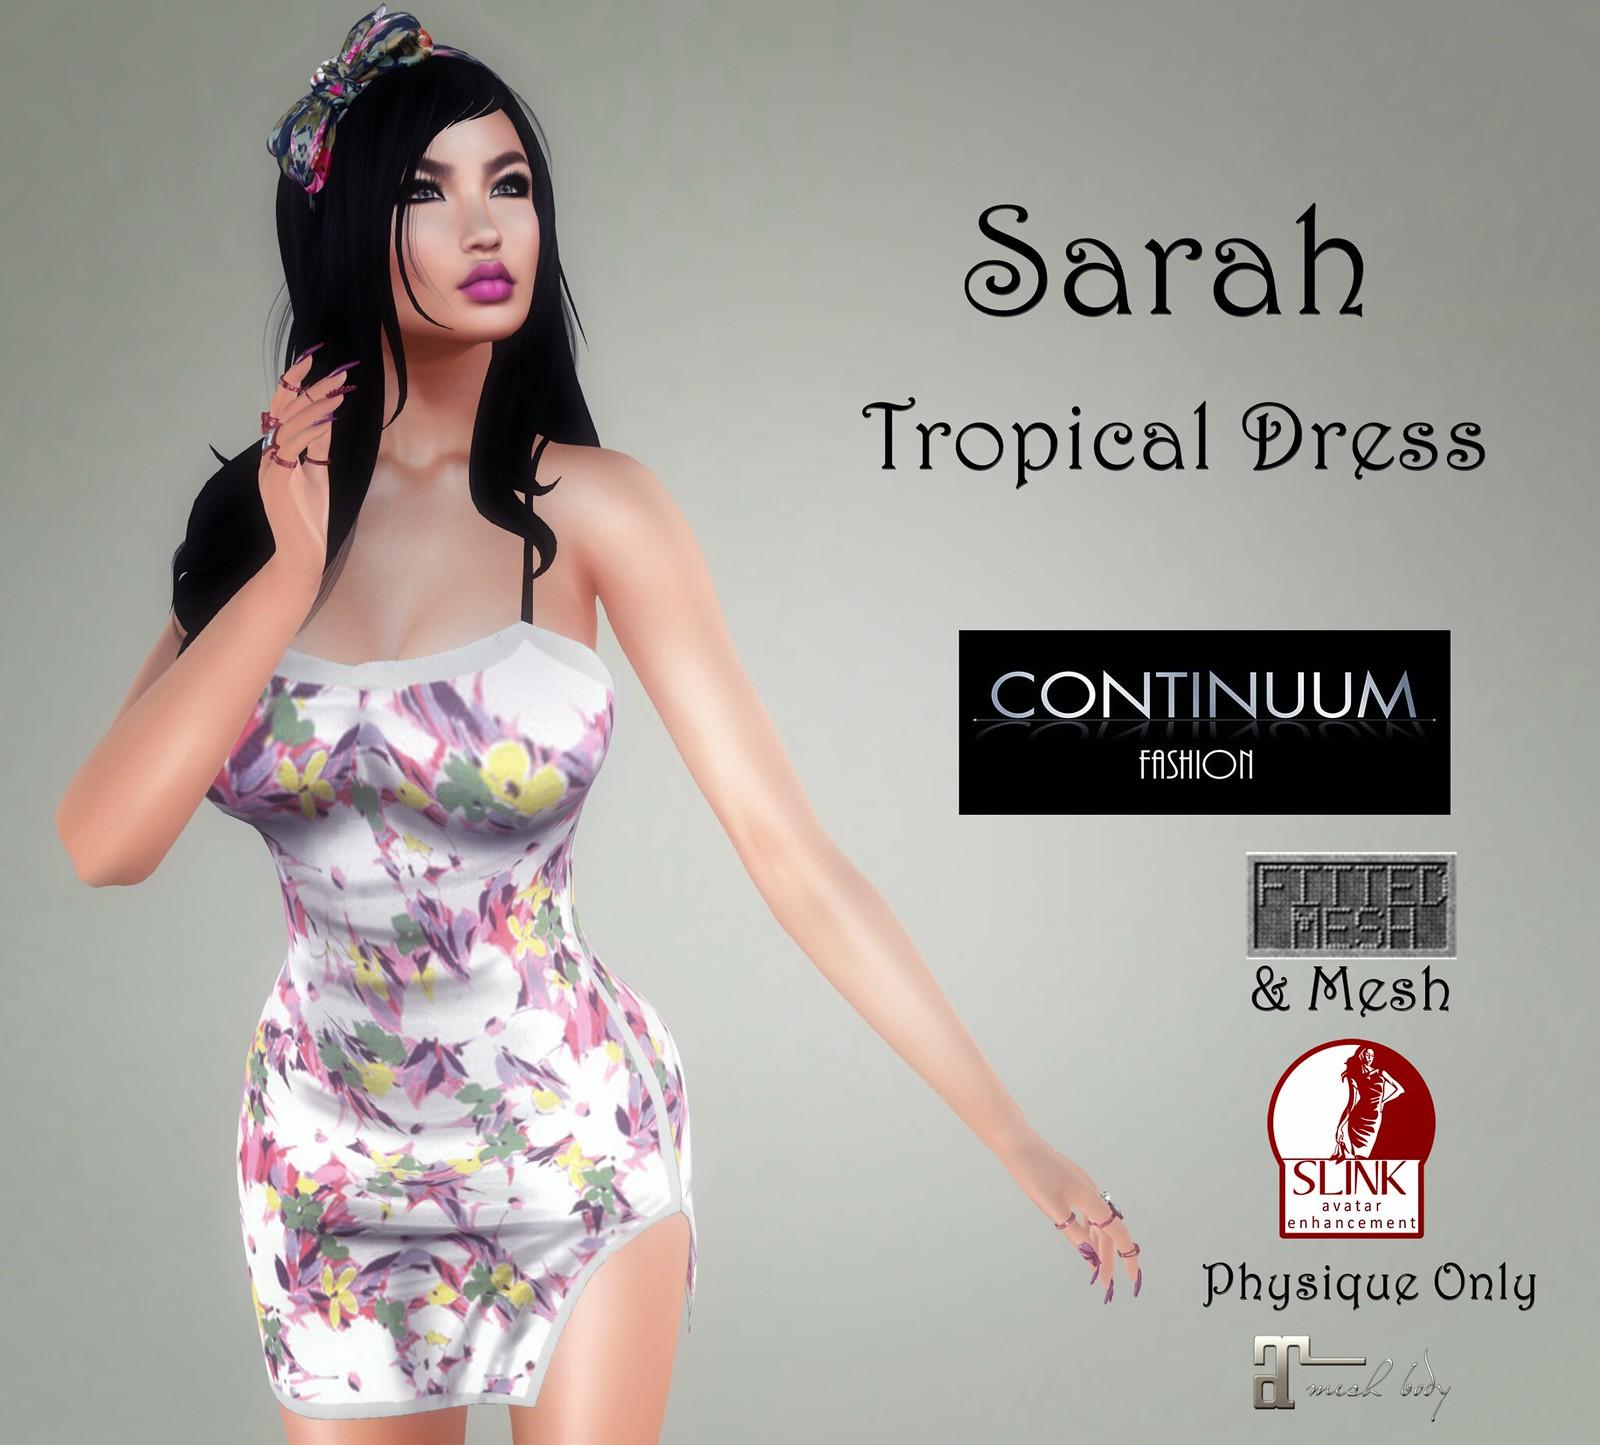 Continuum Sarah Tropical - PROMO 50% OFF - only @ Continuum Fashion Mainstore